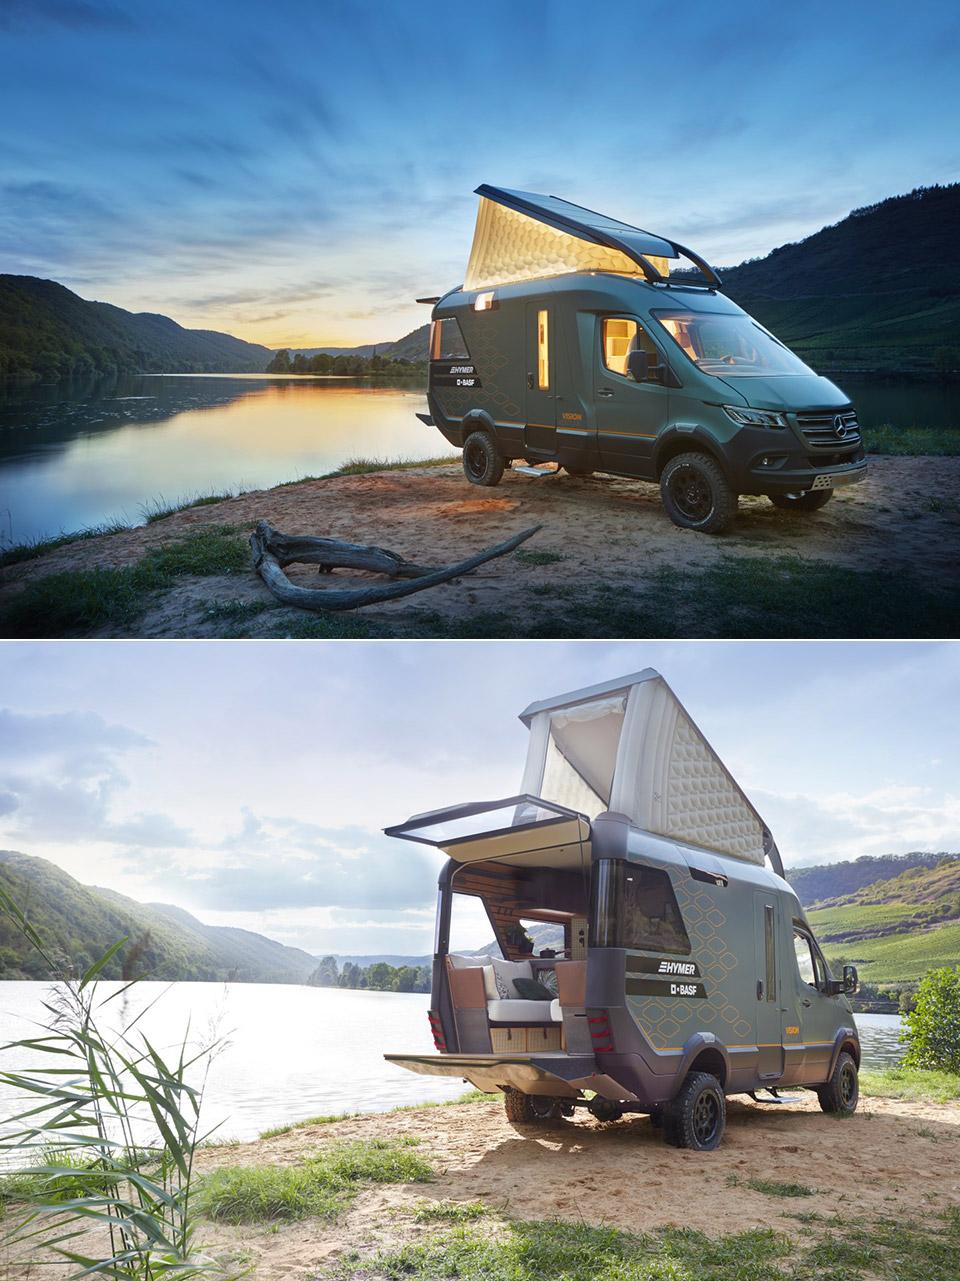 HYMER VisionVenture Expedition Camper Van